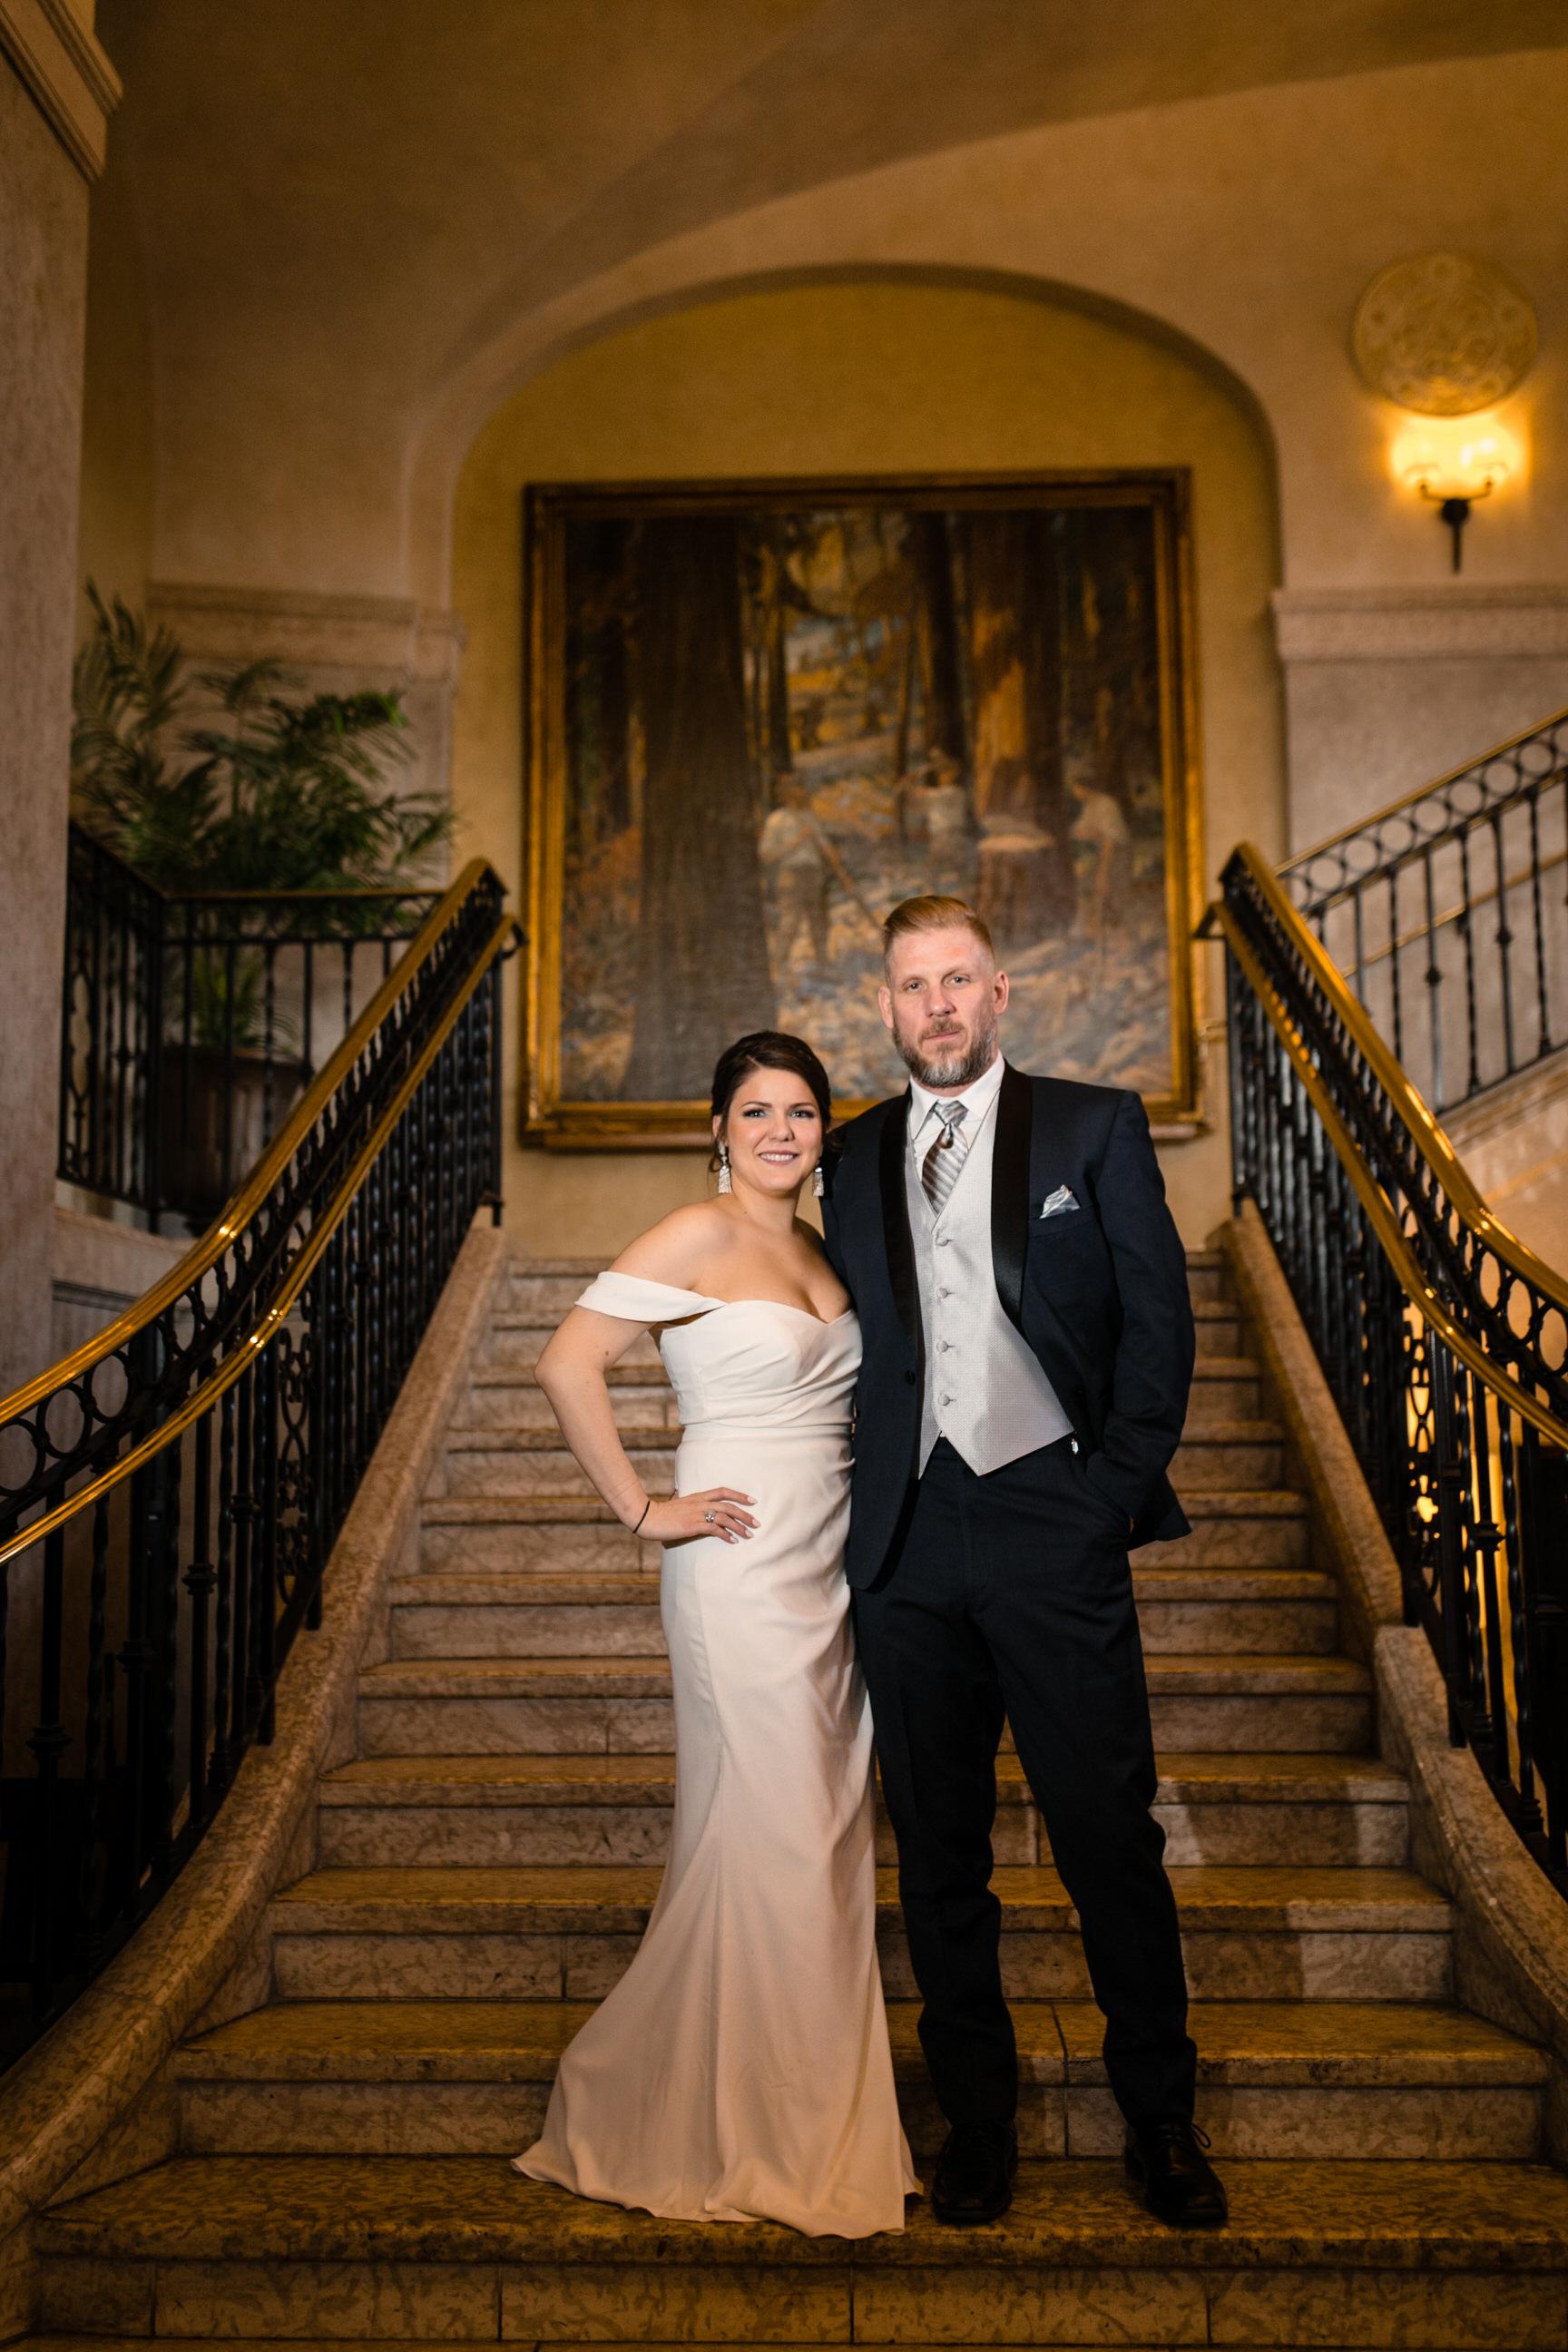 Fairmont Banff Springs Hotel Wedding Photos on staircase